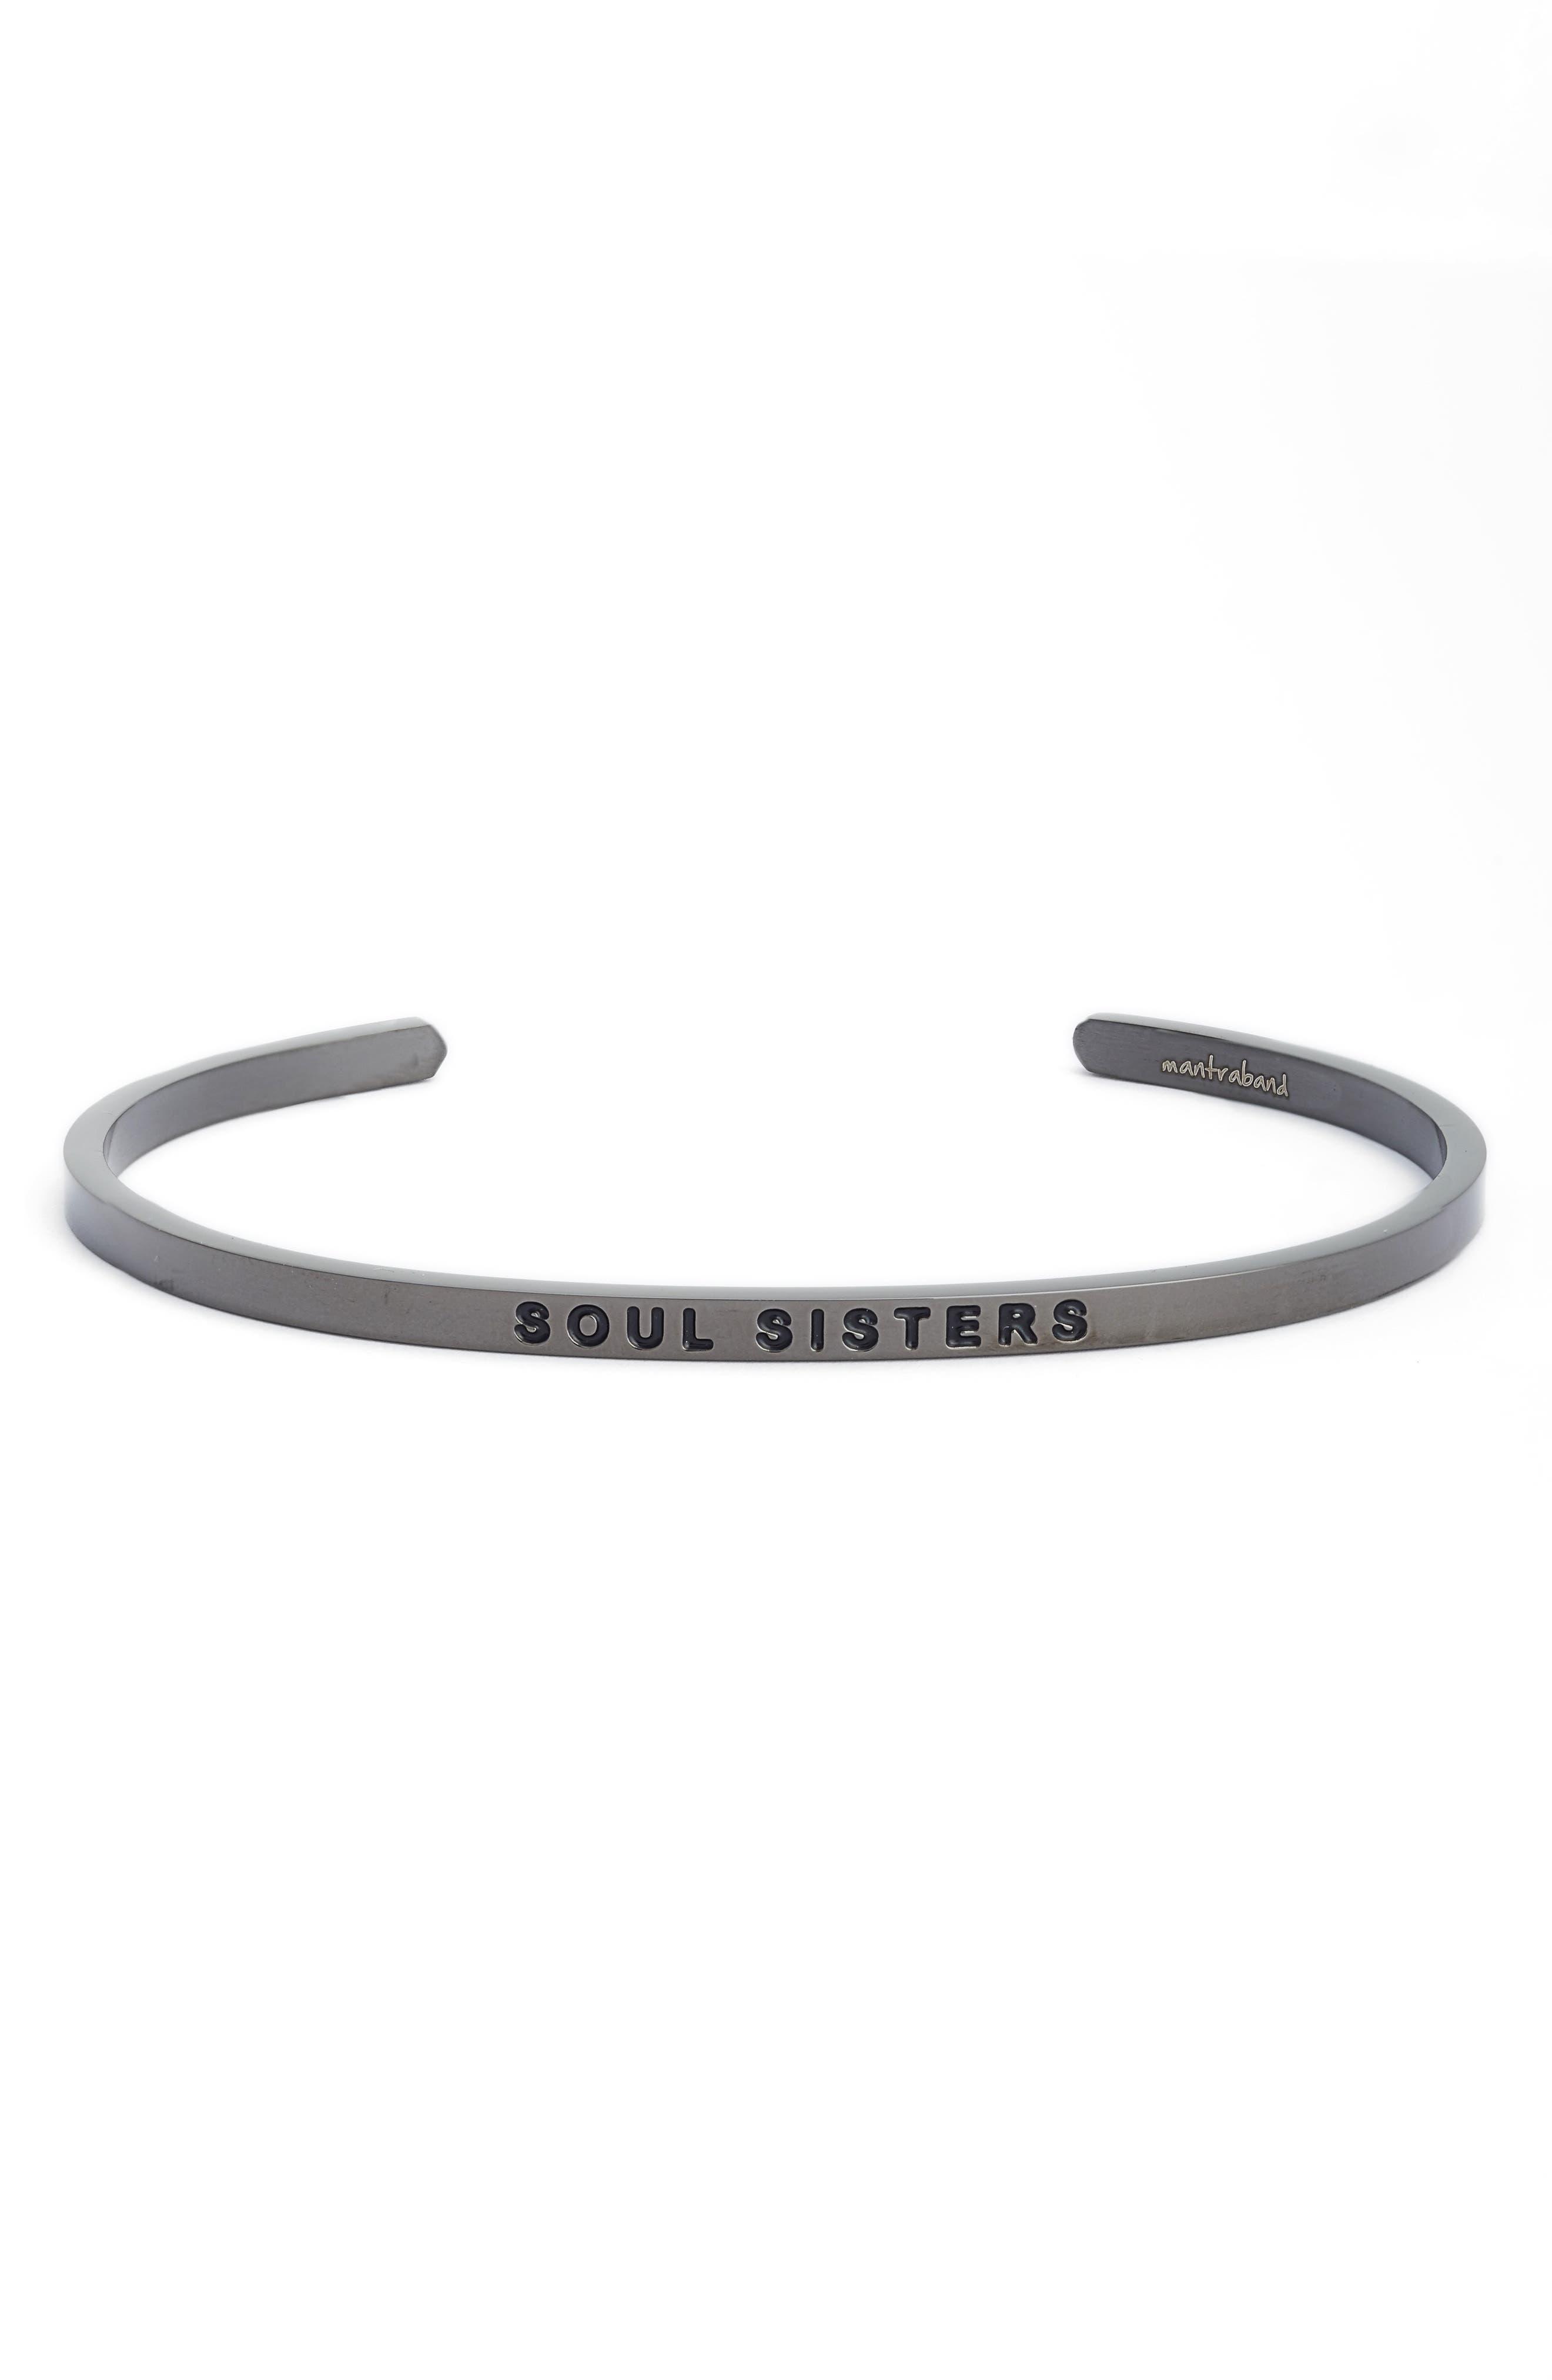 Soul Sisters Cuff Bracelet,                             Main thumbnail 1, color,                             Moon Gray